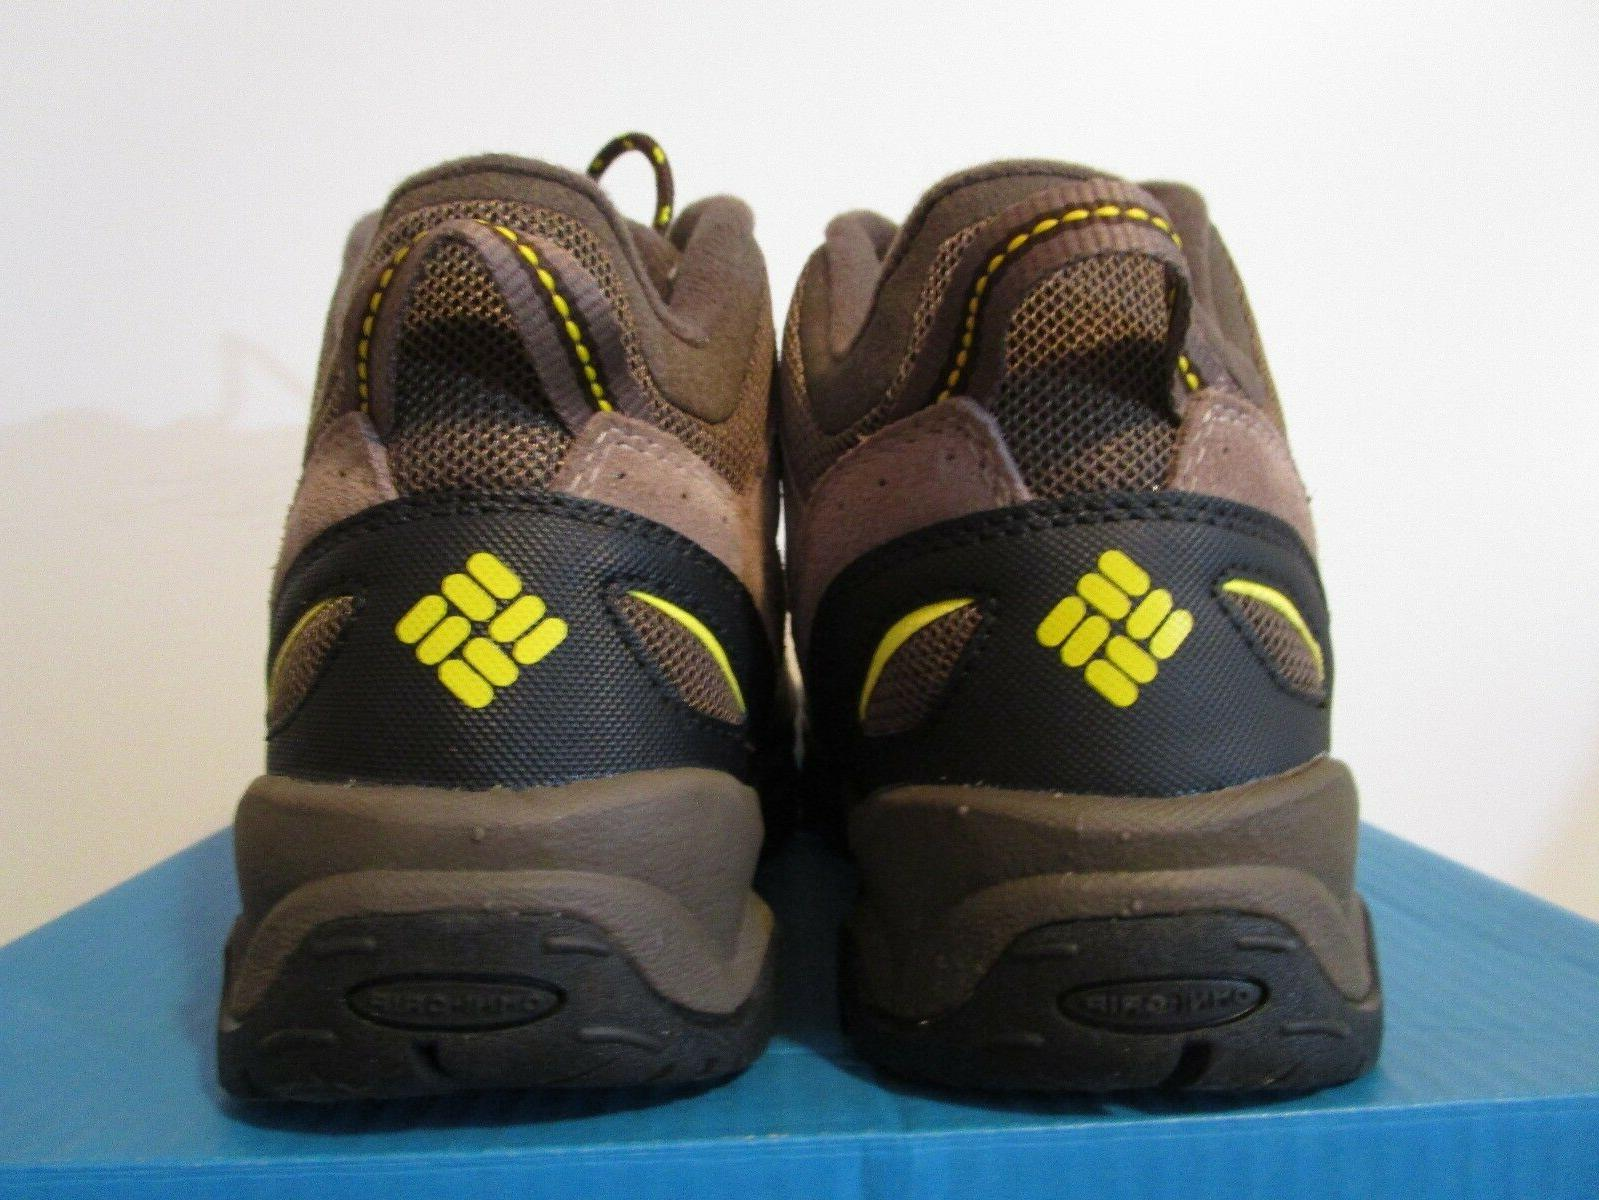 II Waterproof Hiking Trail Mid Hiker Boots